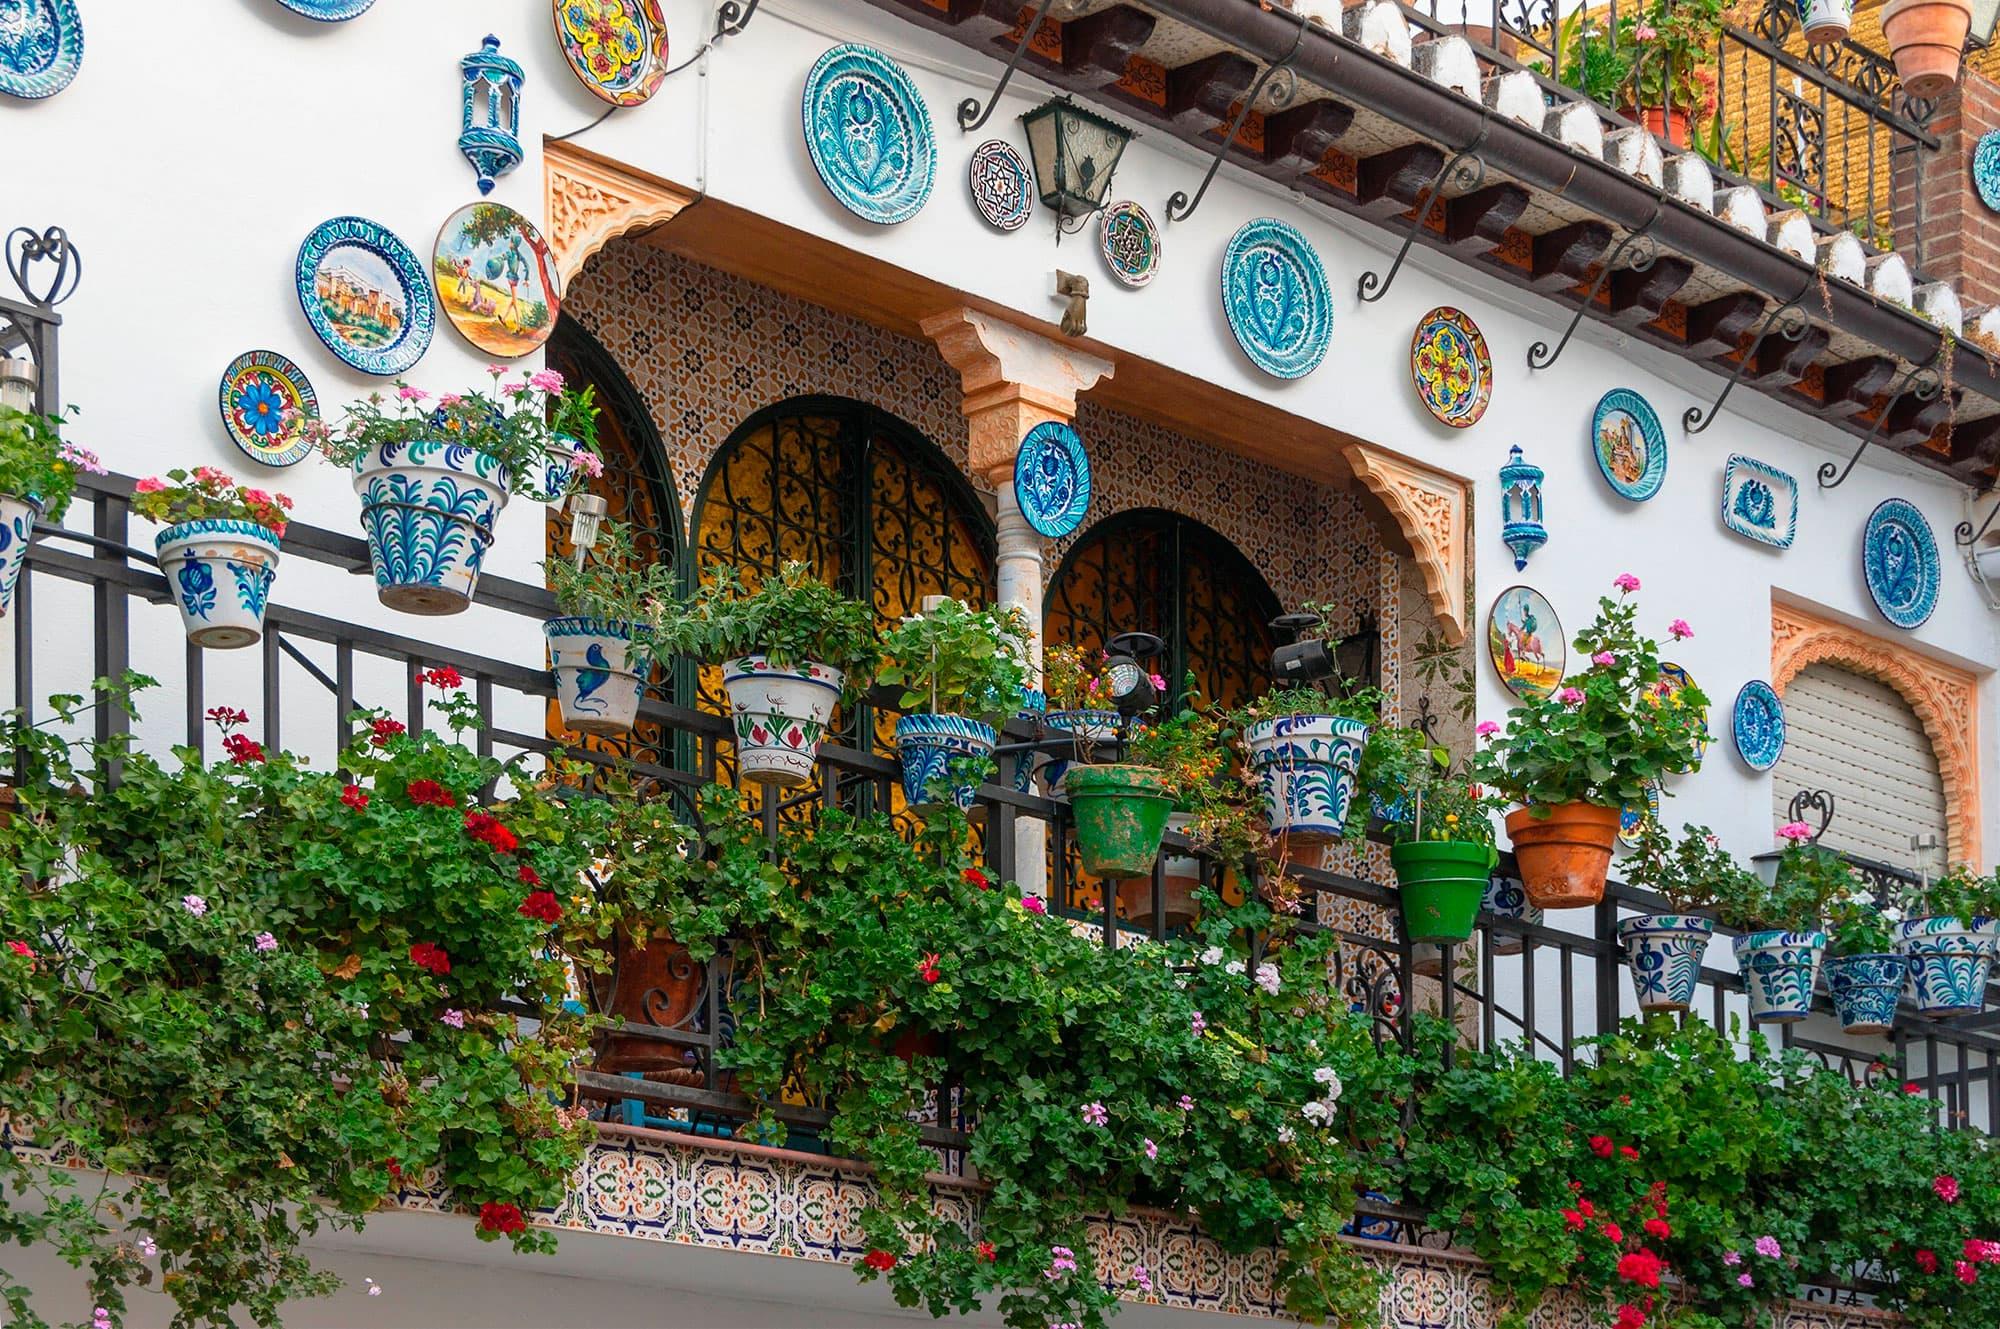 Recreando la romántica ruta de Washington Irving - España- imagen #7